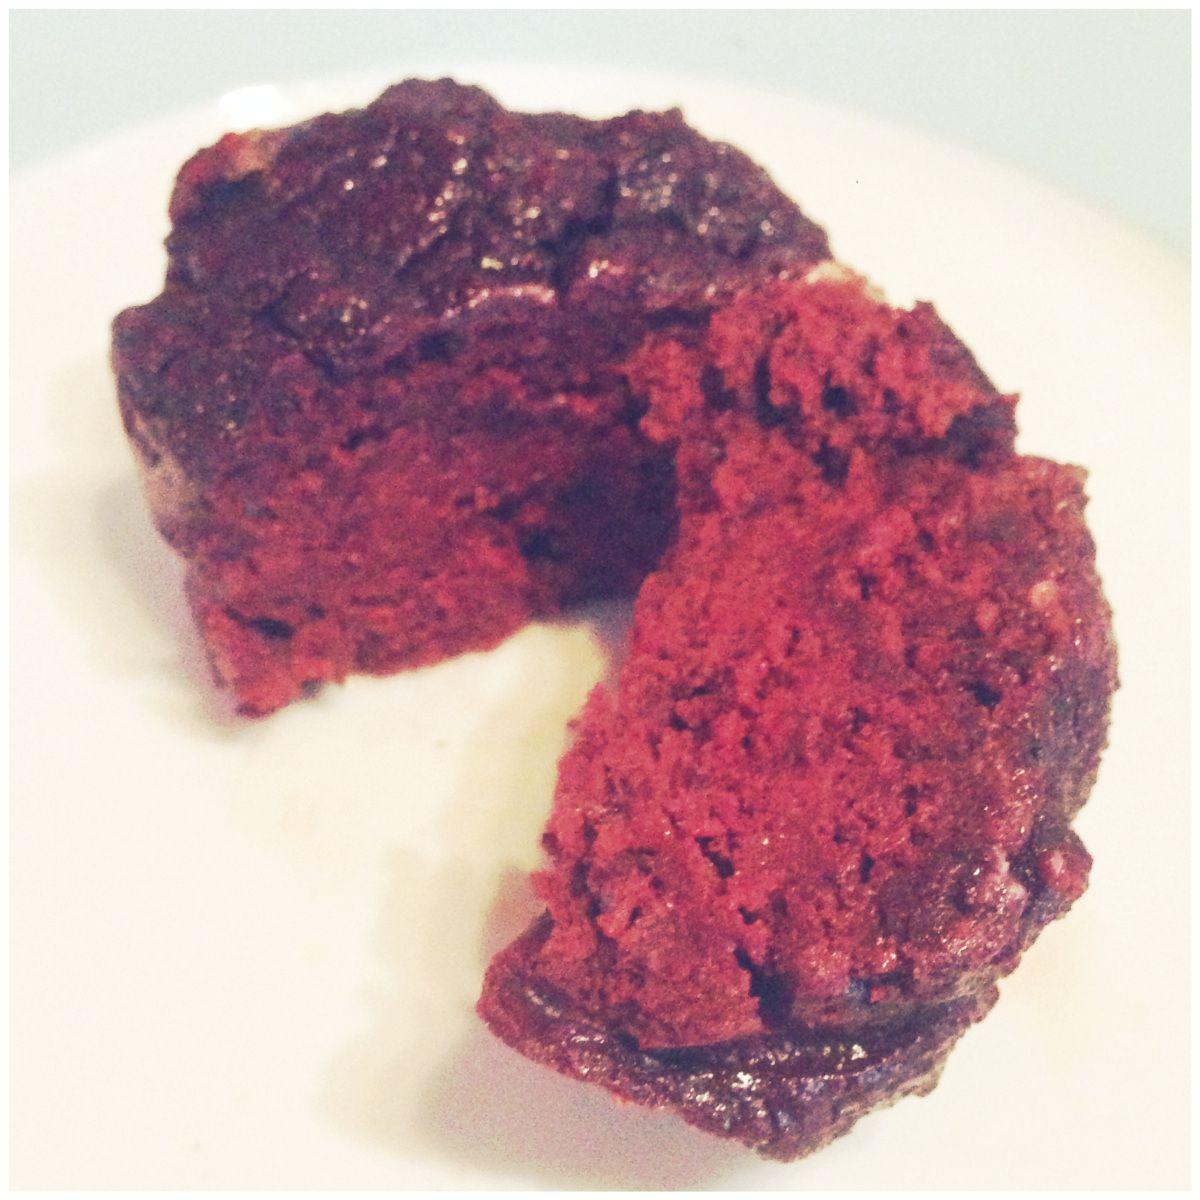 Red Velvet Choc-Beet Cupcakes